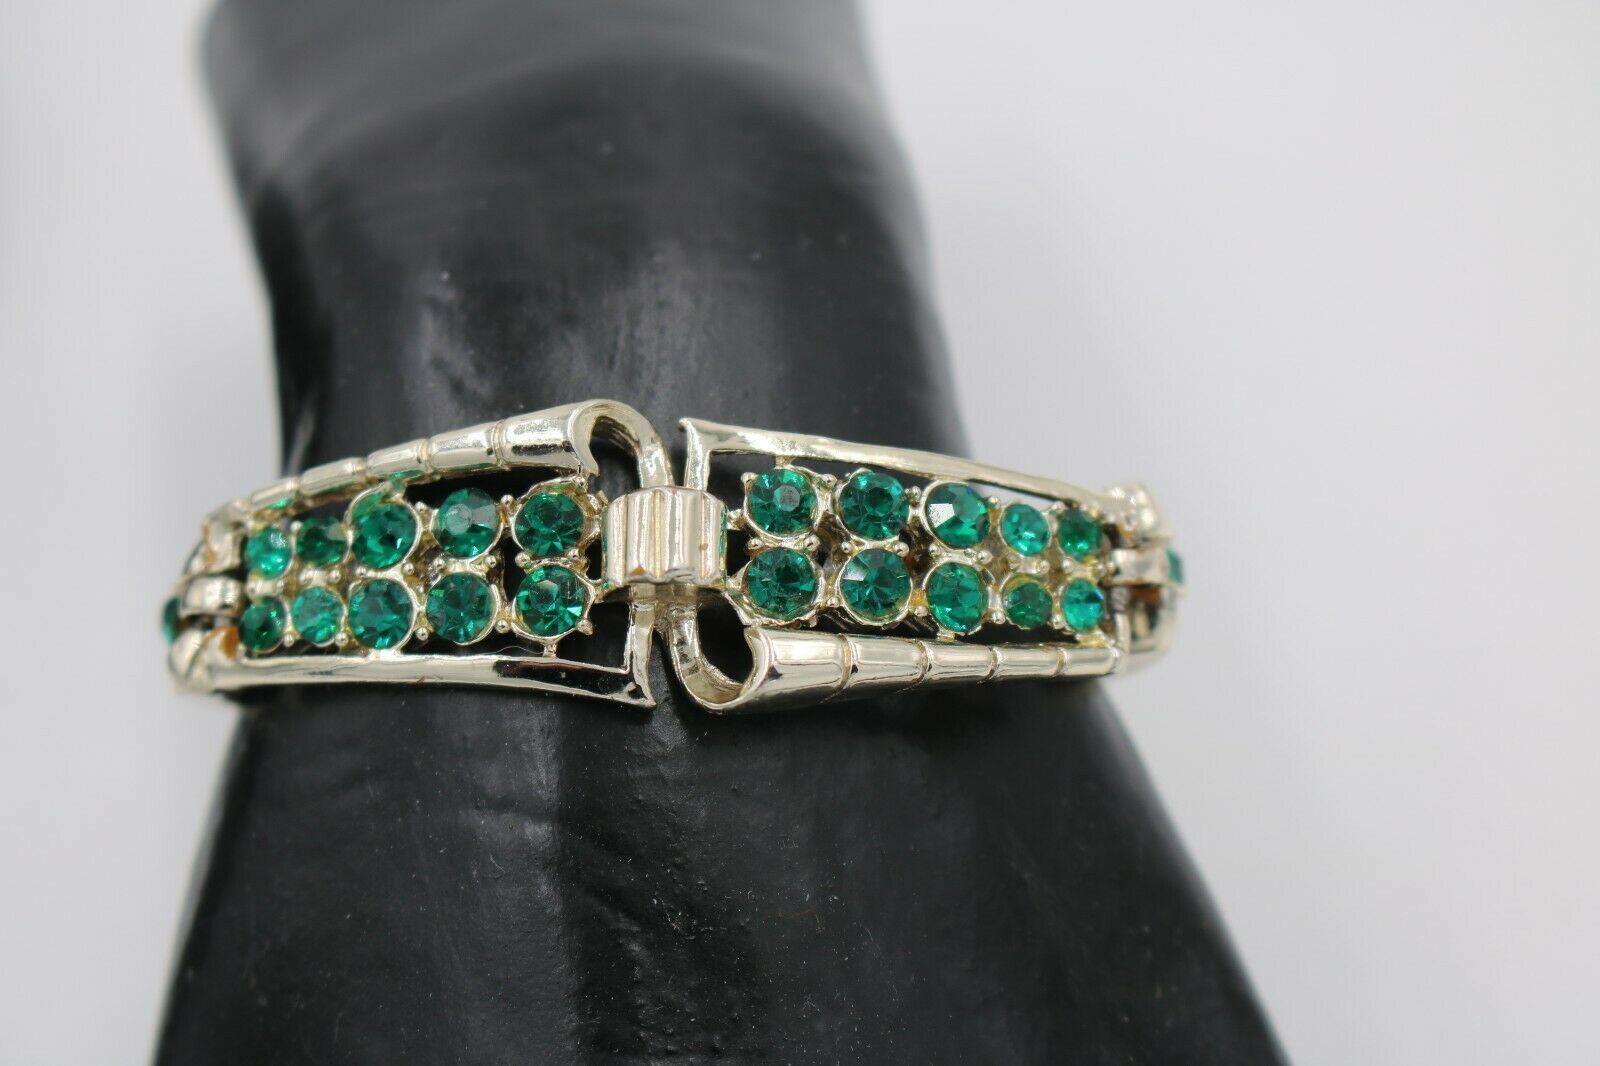 Vintage Emerald Green Rhinestone Link Bracelet Made with Swarovski Rhinestones